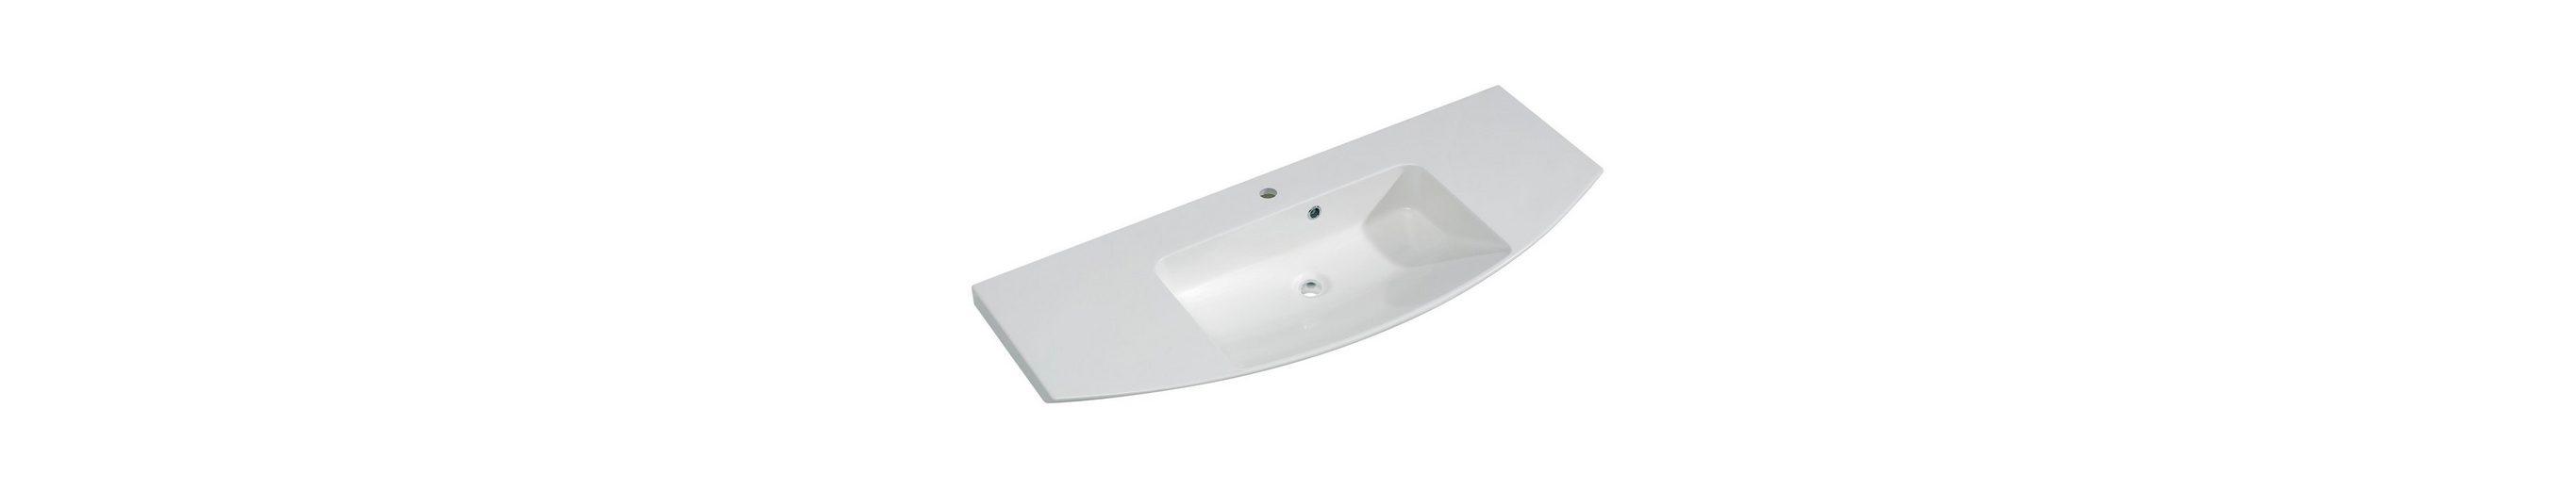 Mineralgussmarmor Waschtisch / Waschbecken »Cassca« 121 cm